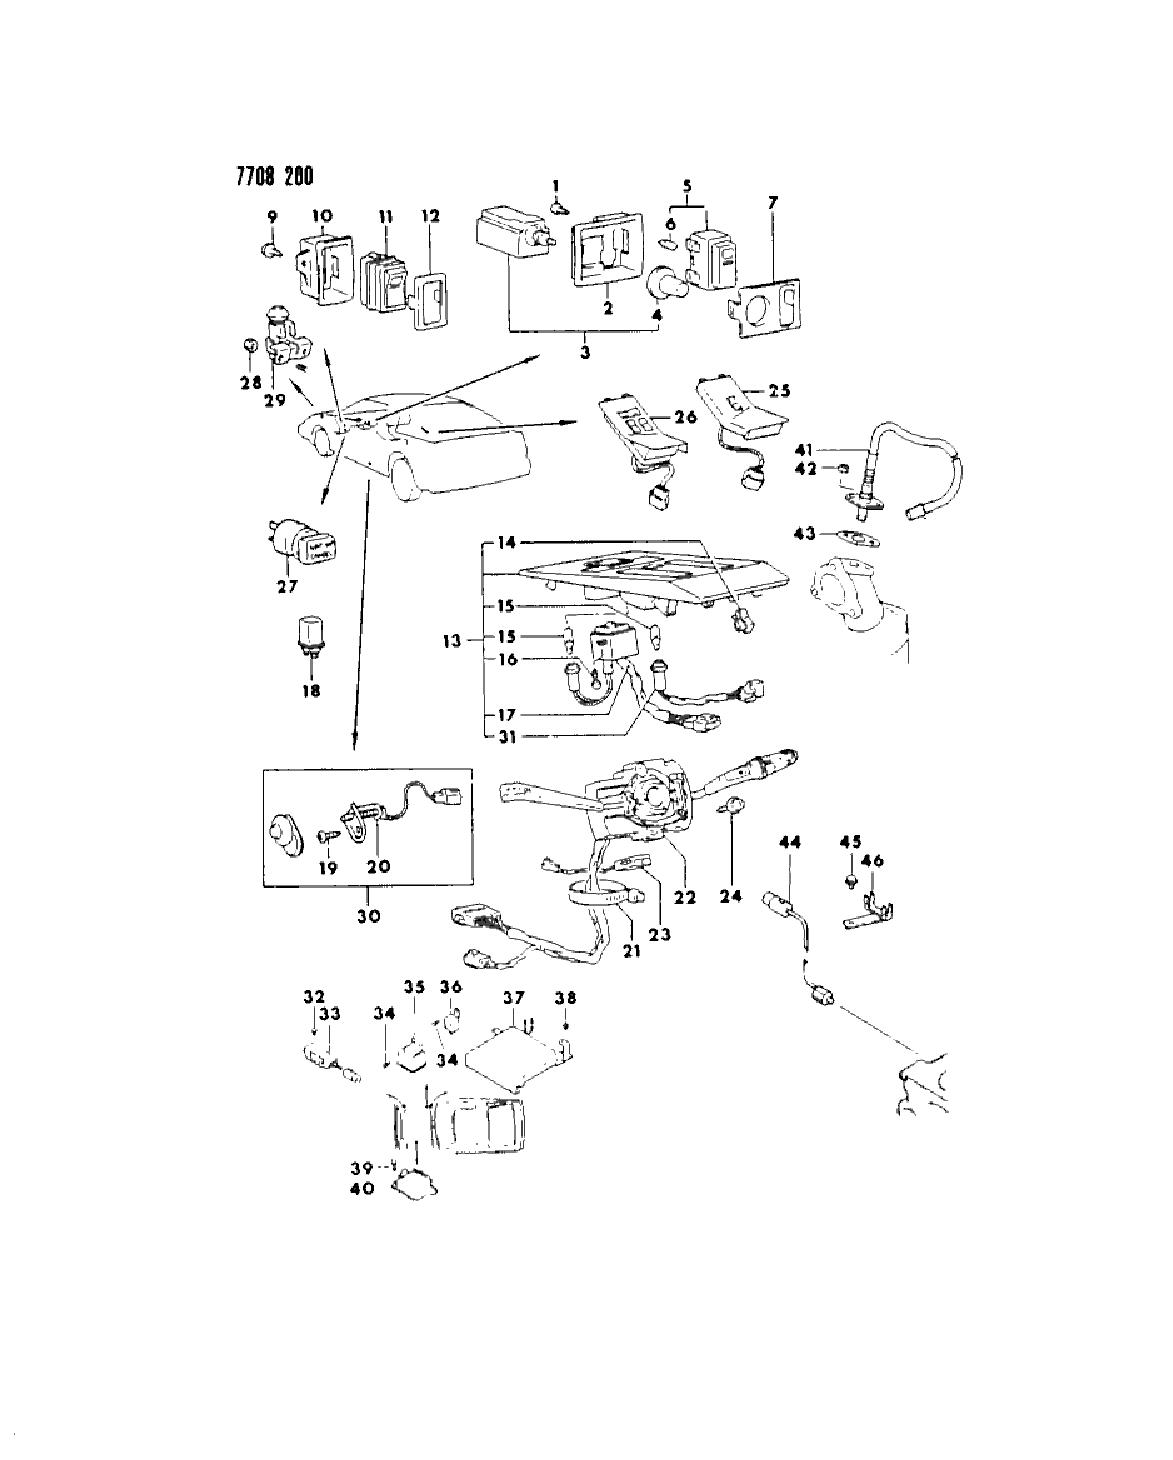 E46 Lcm Wiring Diagram